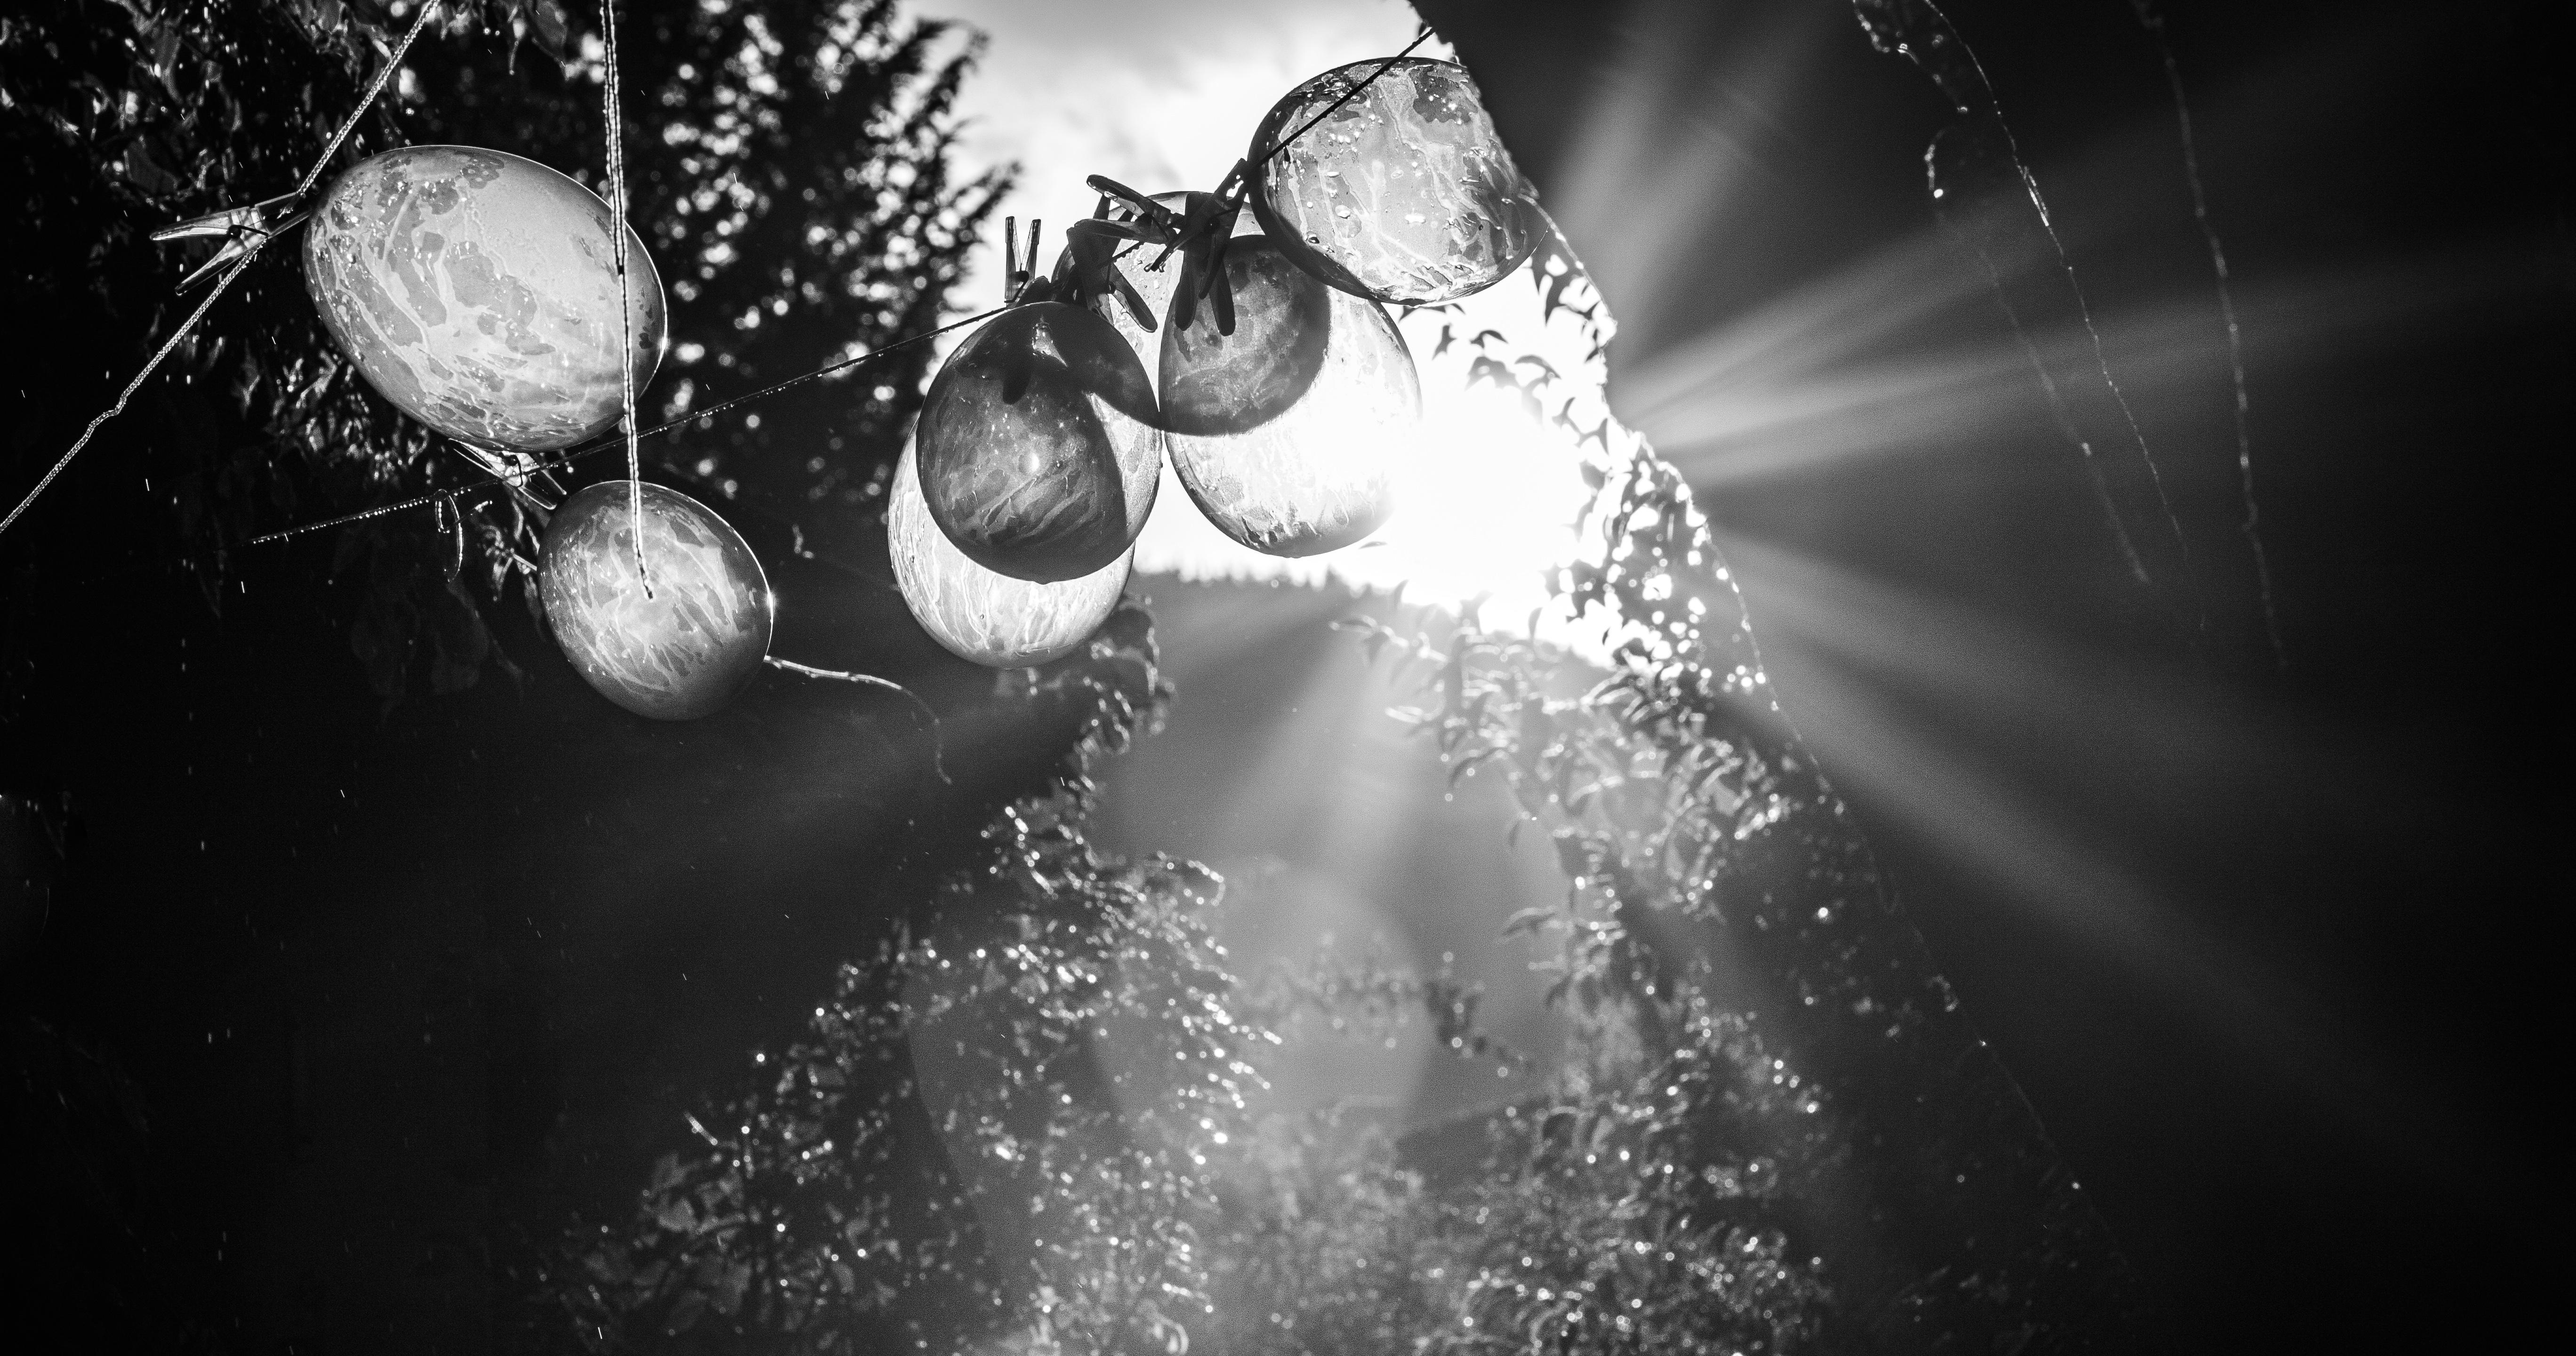 © Jana Enzelberger